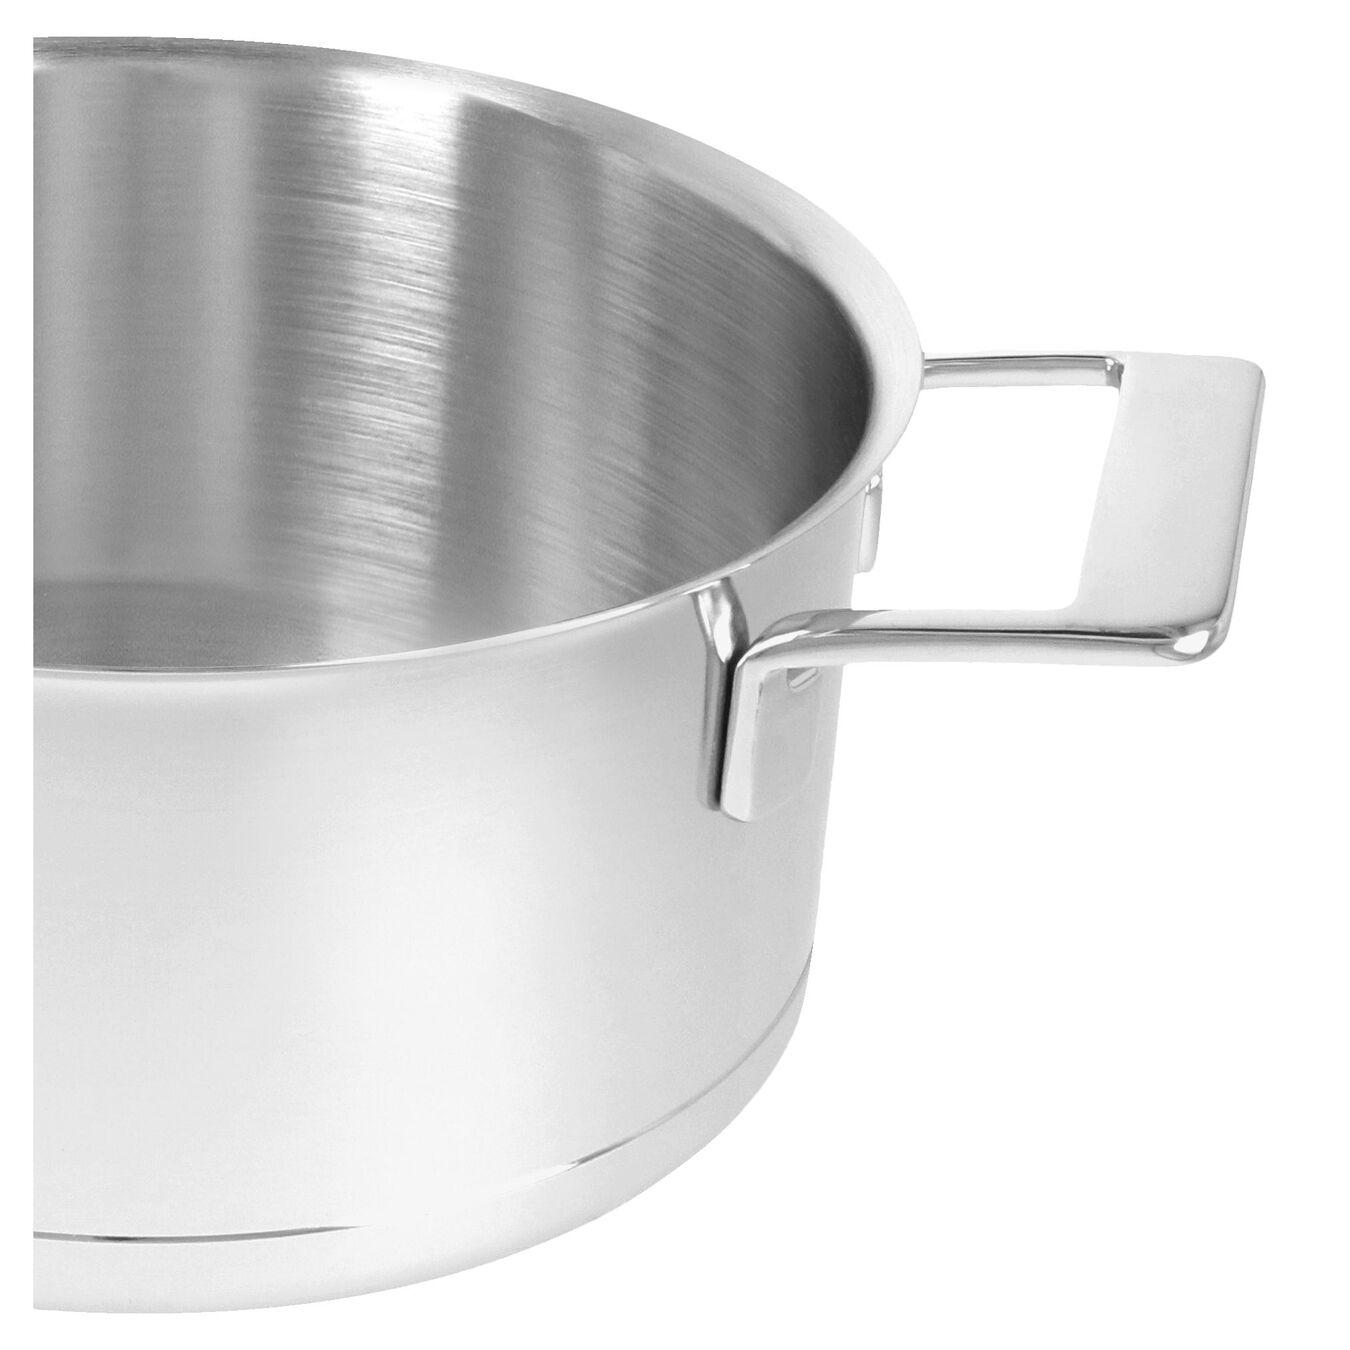 Kookpot met dubbelwandig deksel 22 cm / 4 l,,large 6